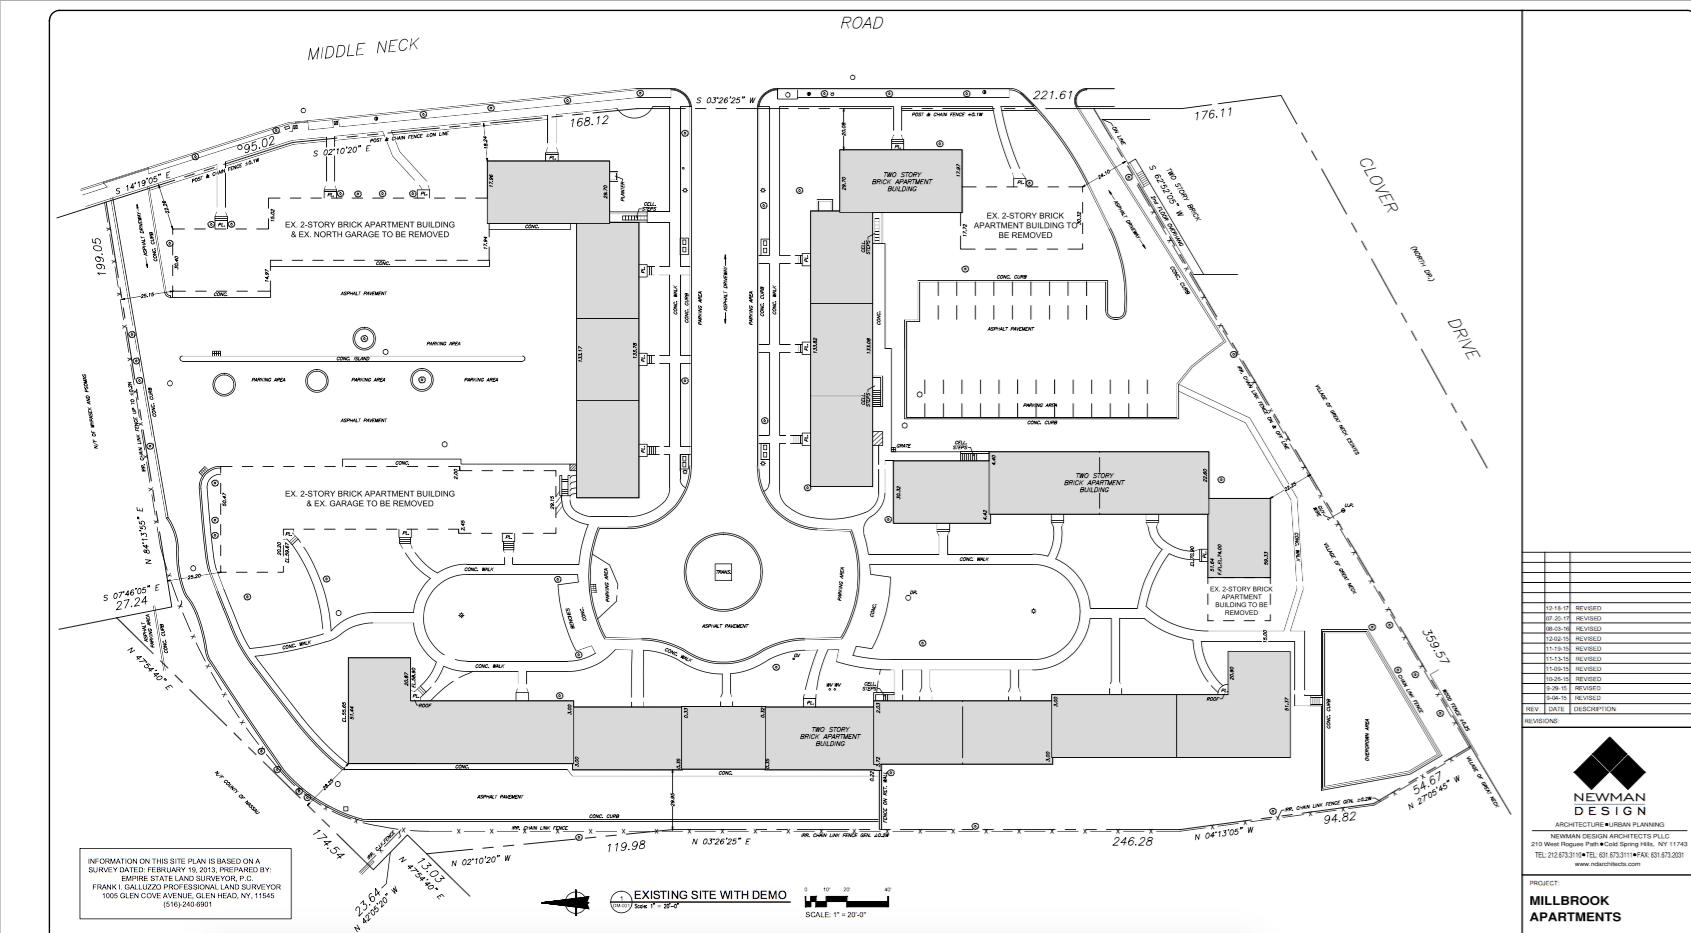 Development Eyed For Millbrook Court Apartments Near